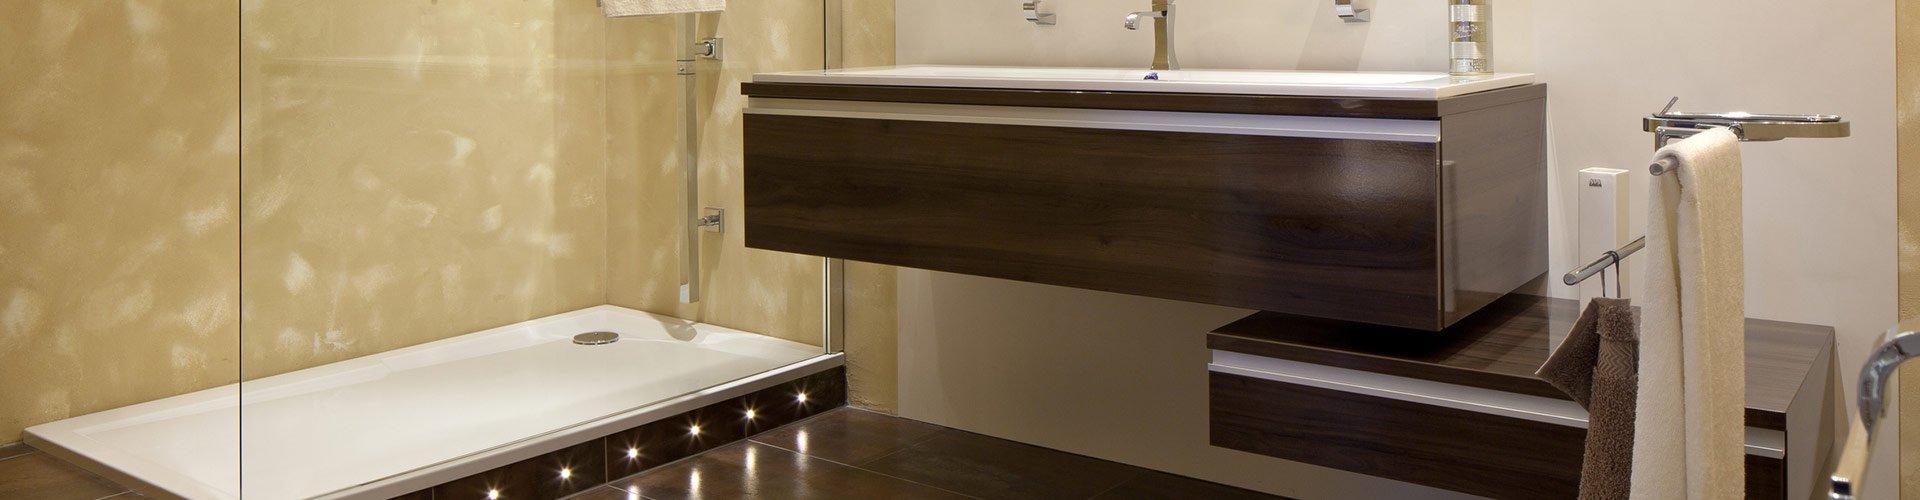 Offene Dusche Ma?e : Alle Duschen auf Lager Auch Sonderma?e per 24h Express